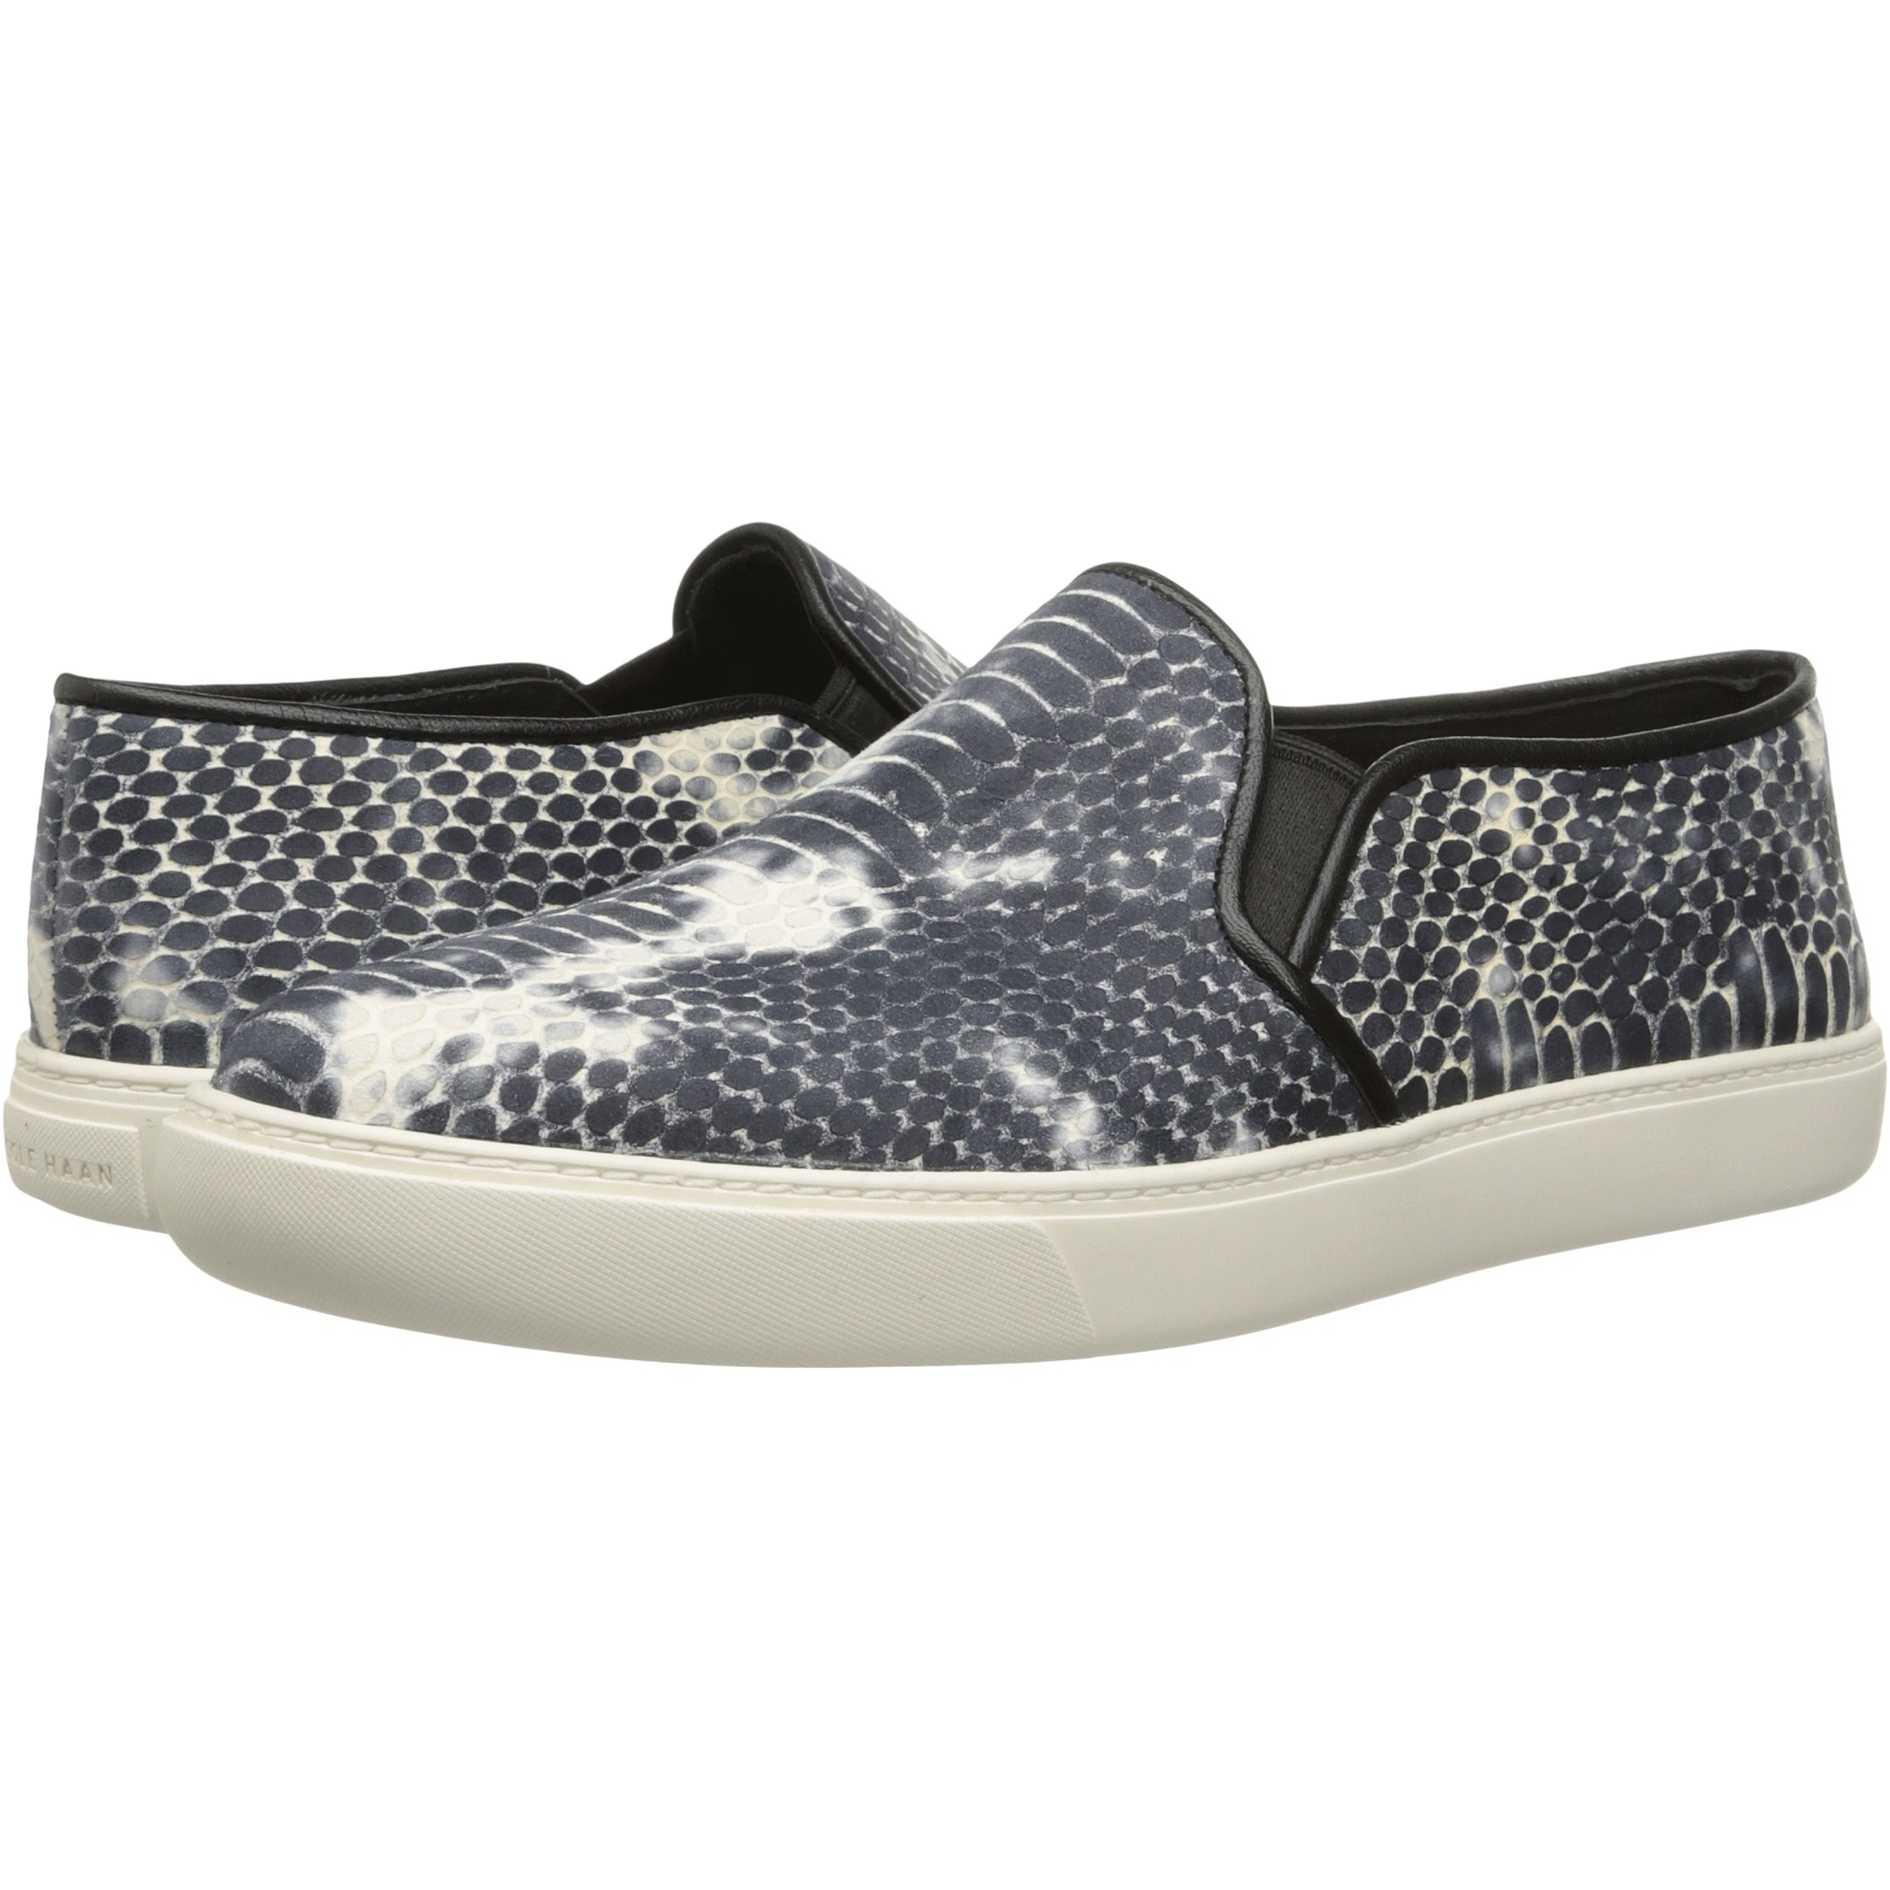 Cole Haan Bowie Slipon Sneaker Black/Vanilla Snake Print pentru dama